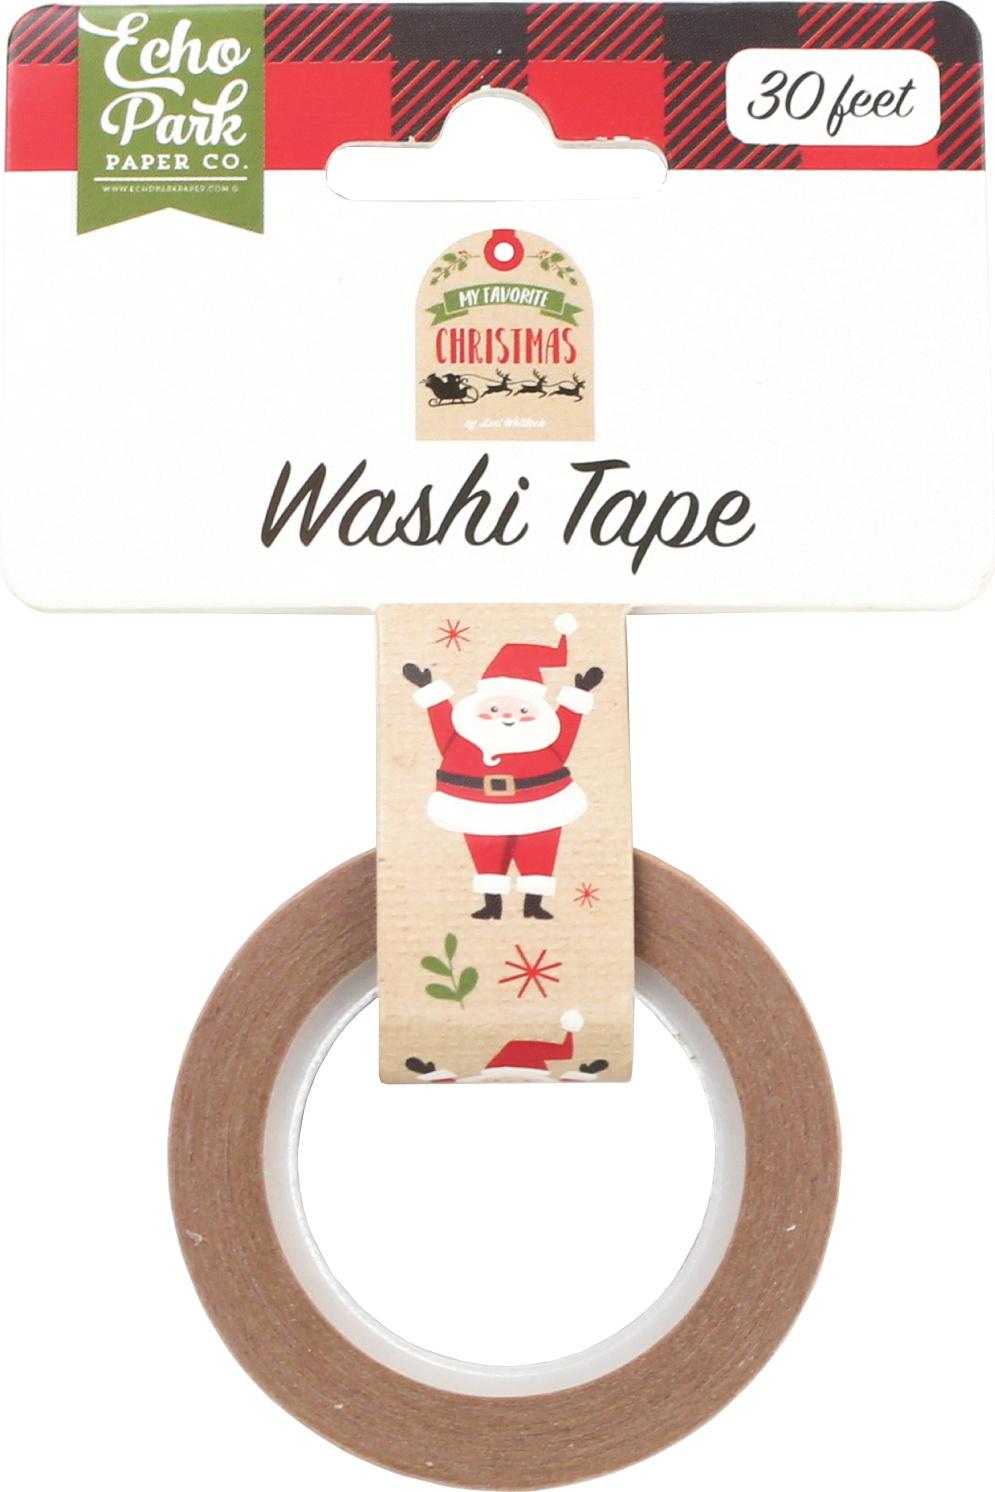 Echo Park My Favorite Christmas Decorative Tape 30'-Celebrate Santa